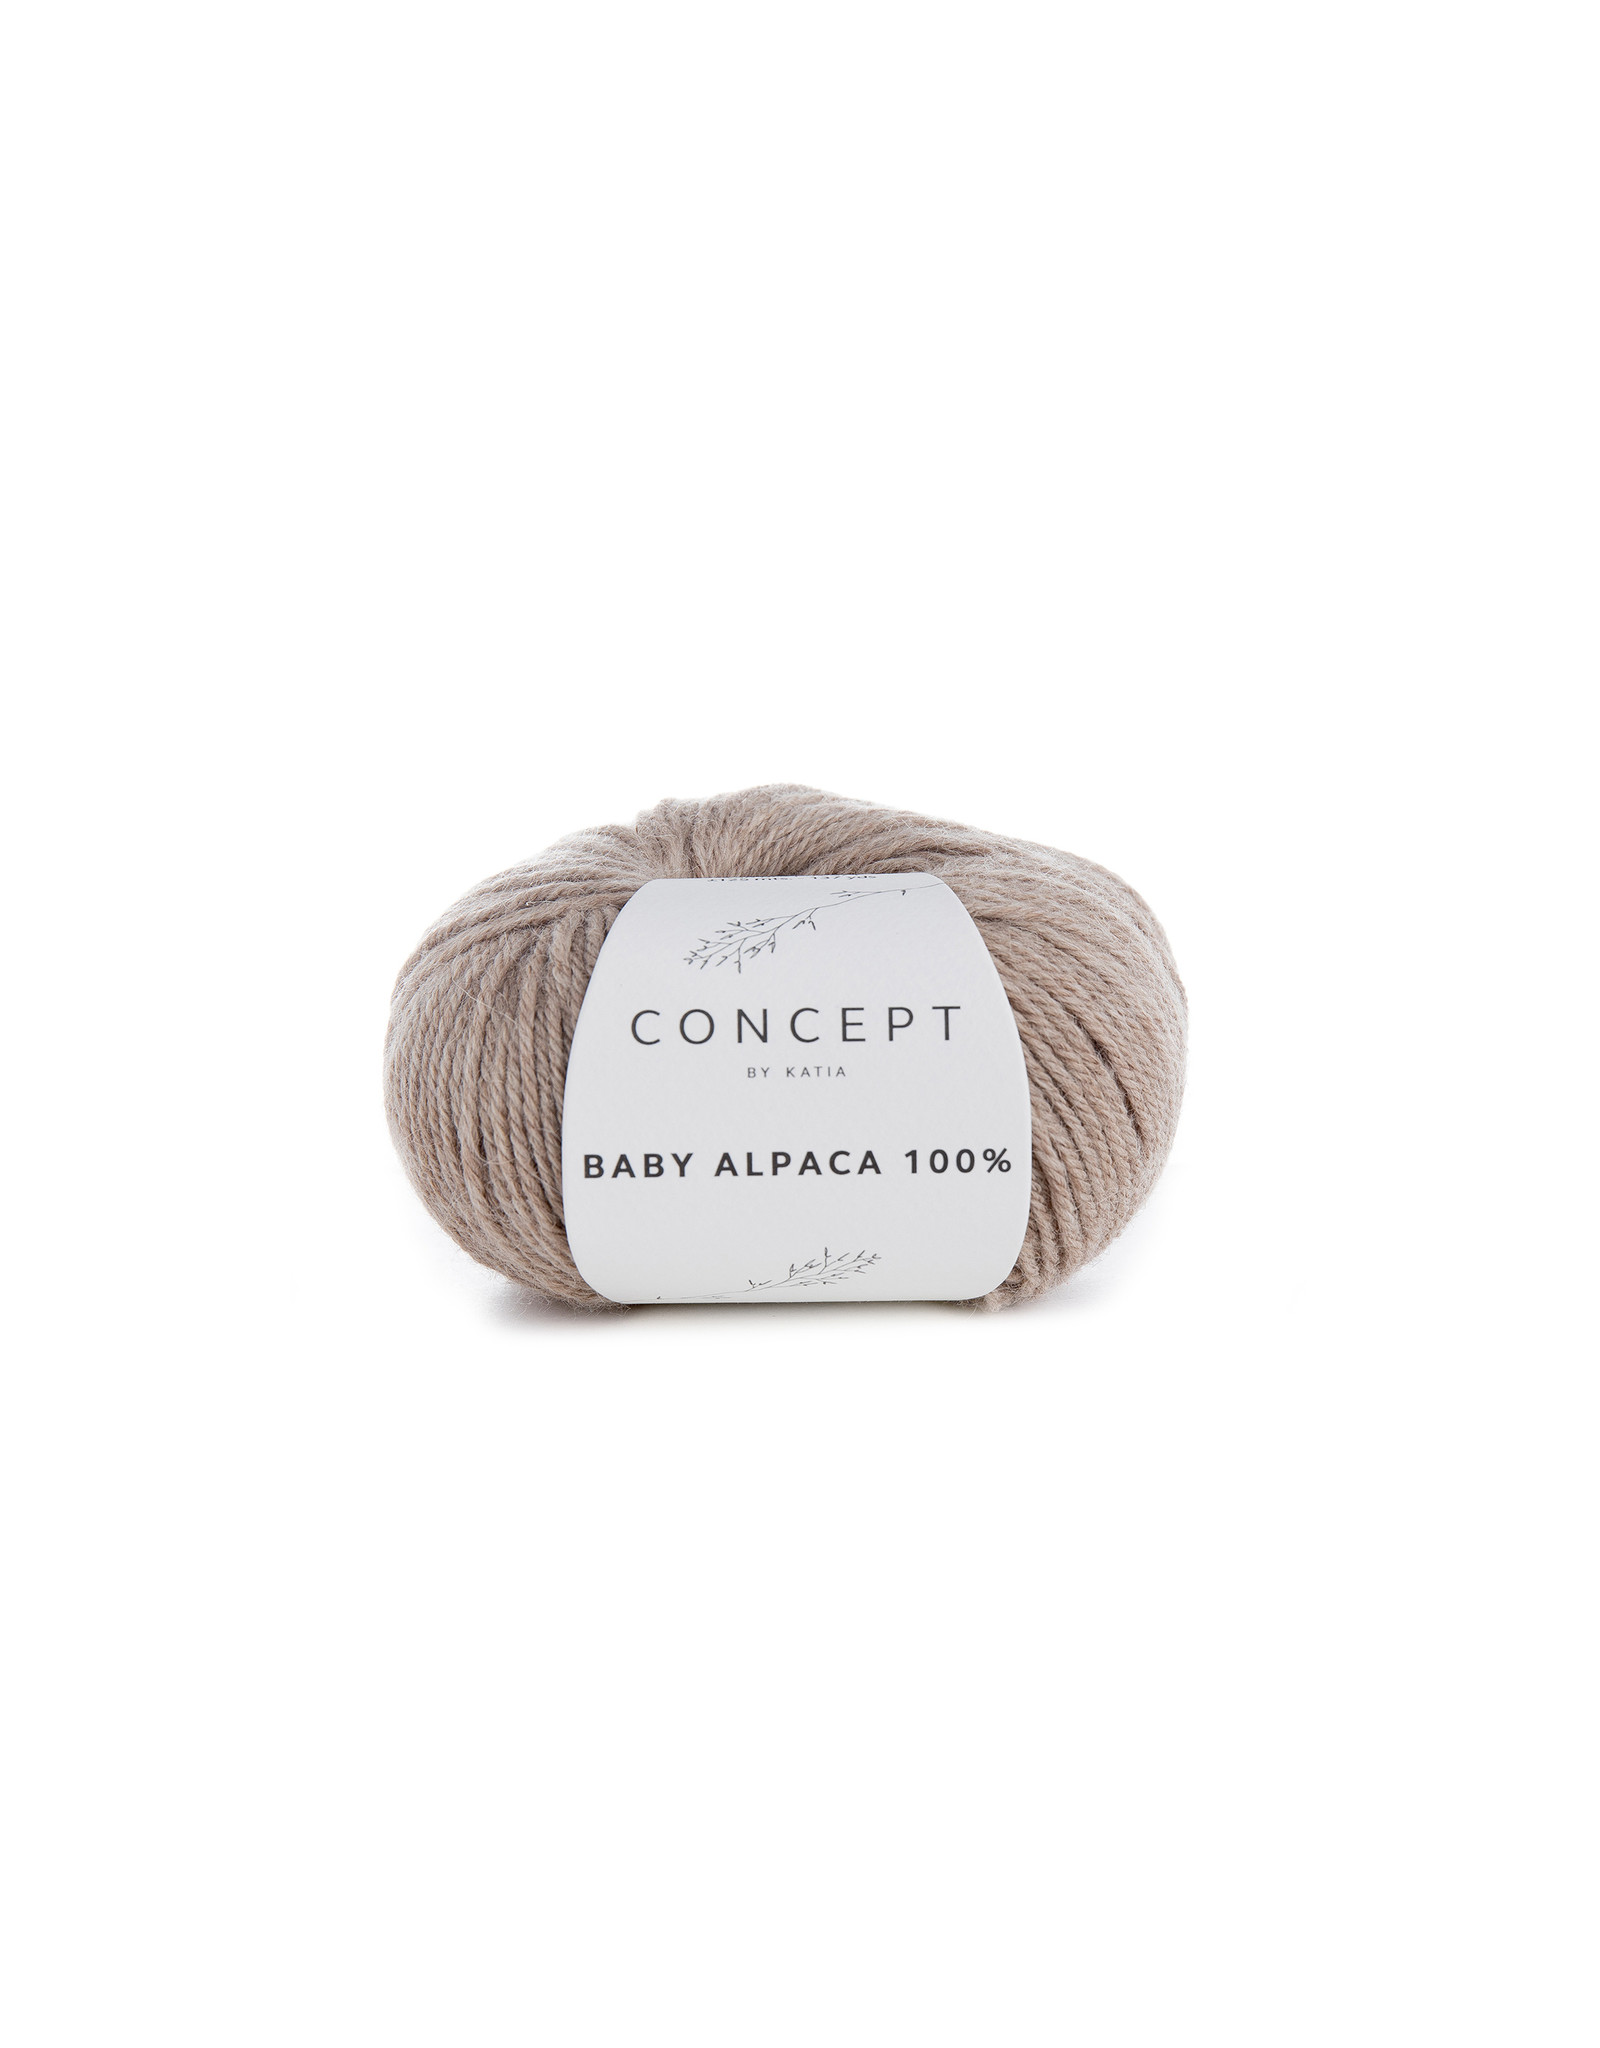 Katia Baby Alpaca 100% - kleur 502 - Steengrijs - 50 gr. = 125 m. - 100% Baby Alpaca